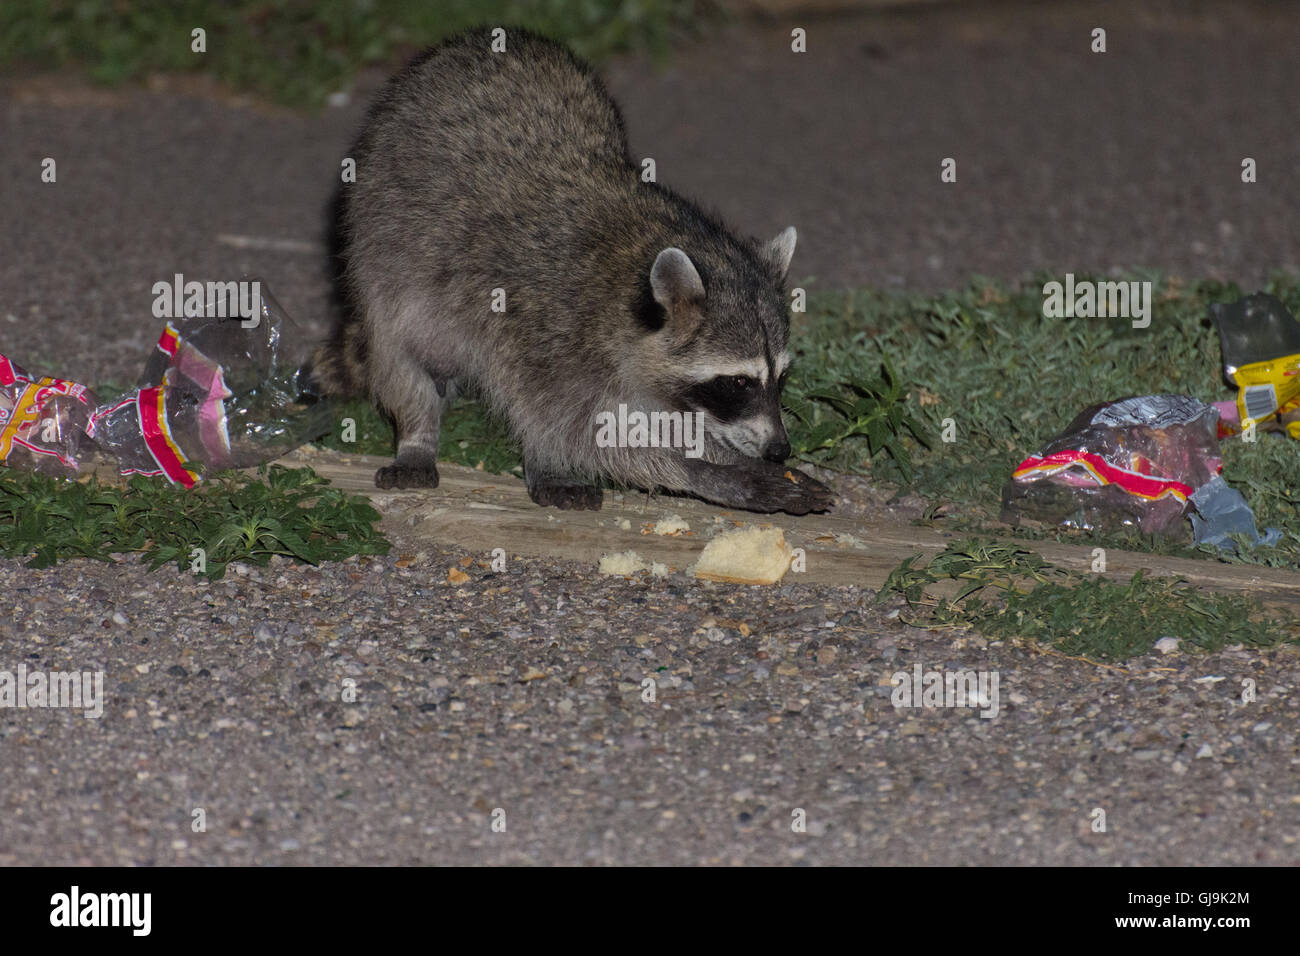 Le raton laveur (Procyon lotor), manger, corbeille. Elephant Butte State Park, New Mexico, USA. Photo Stock